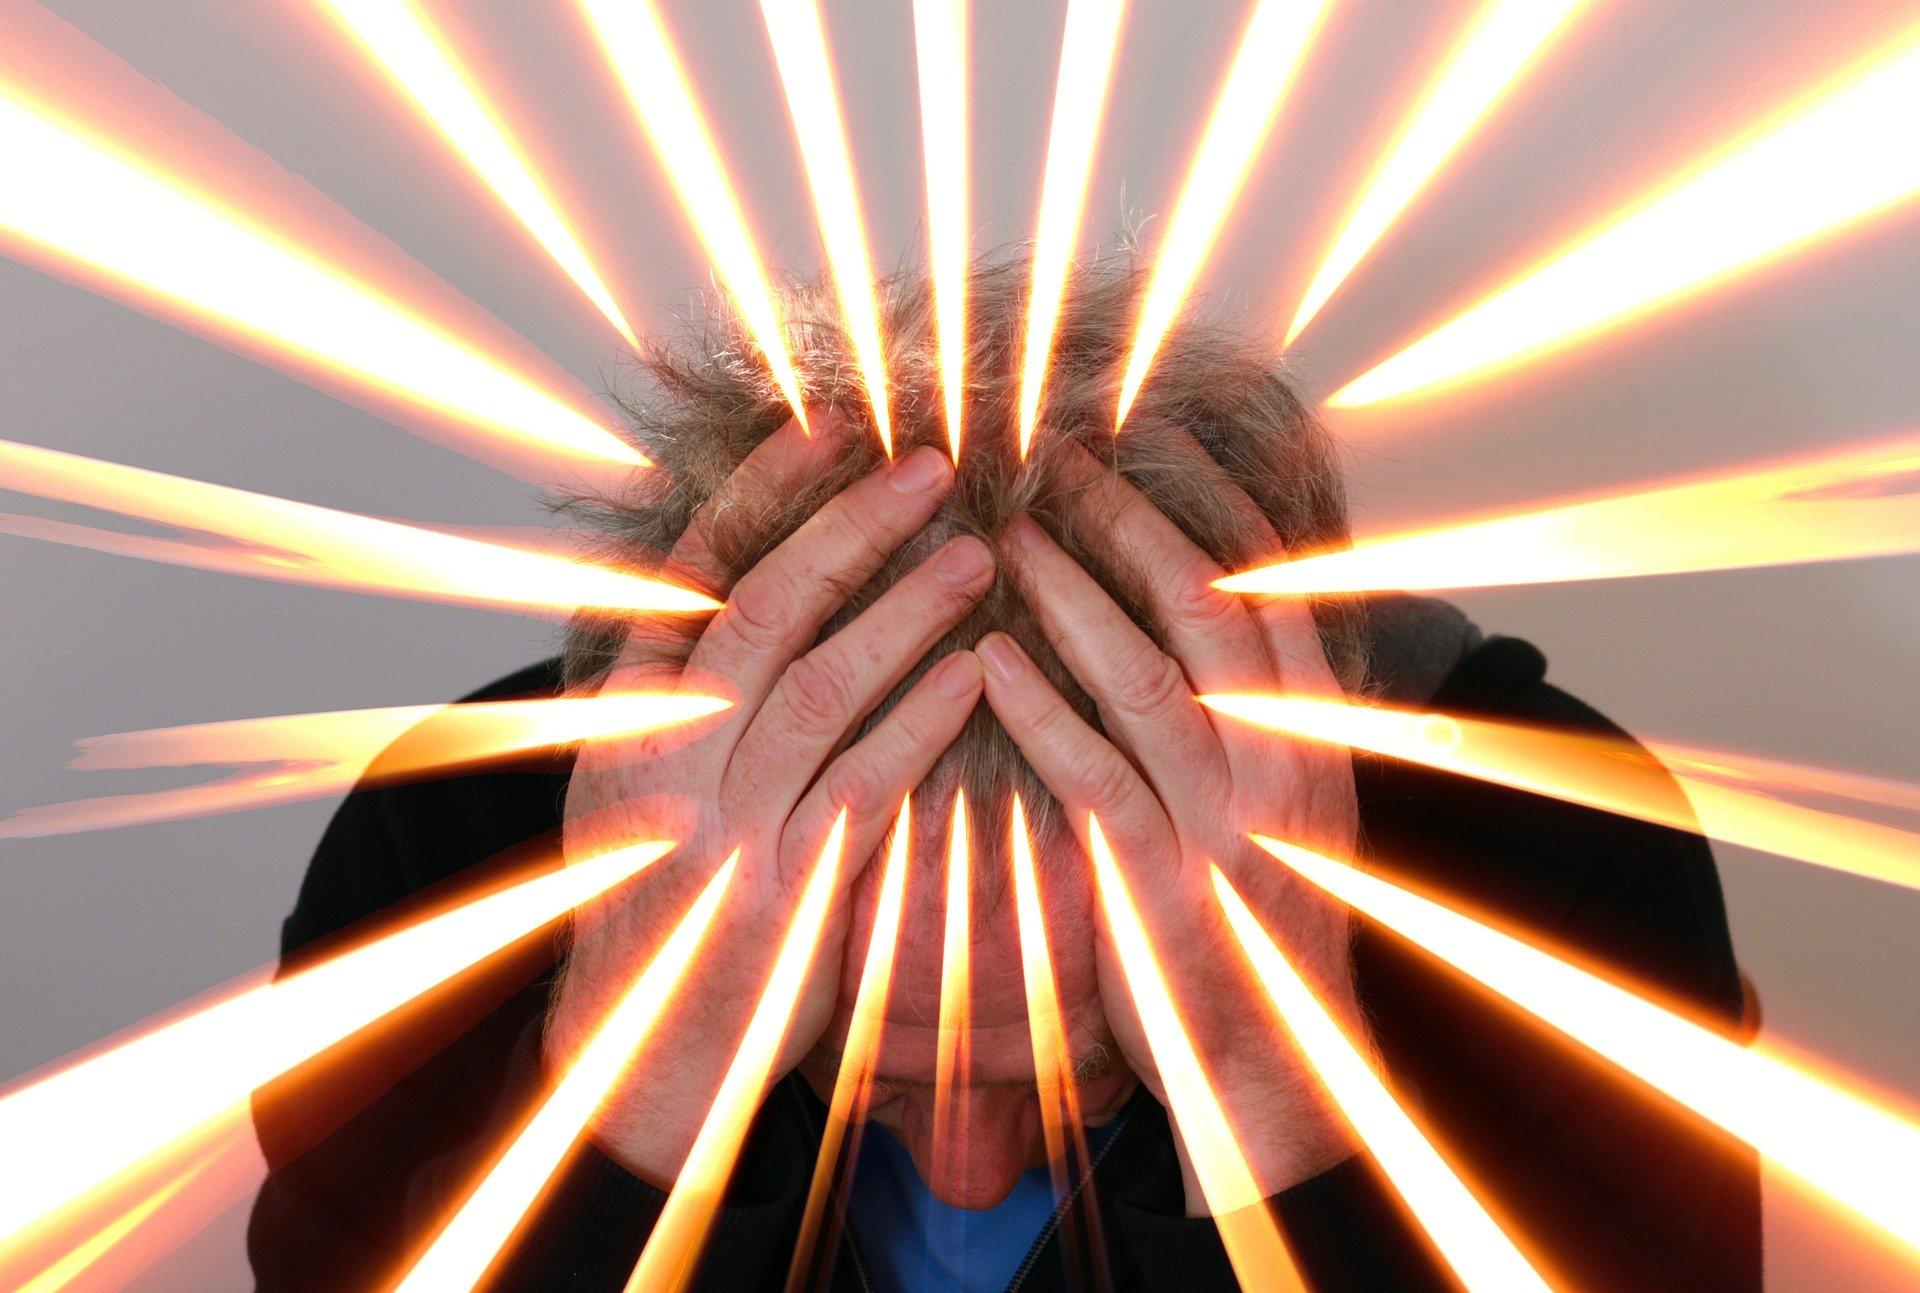 Can Covid Damage the Brain?